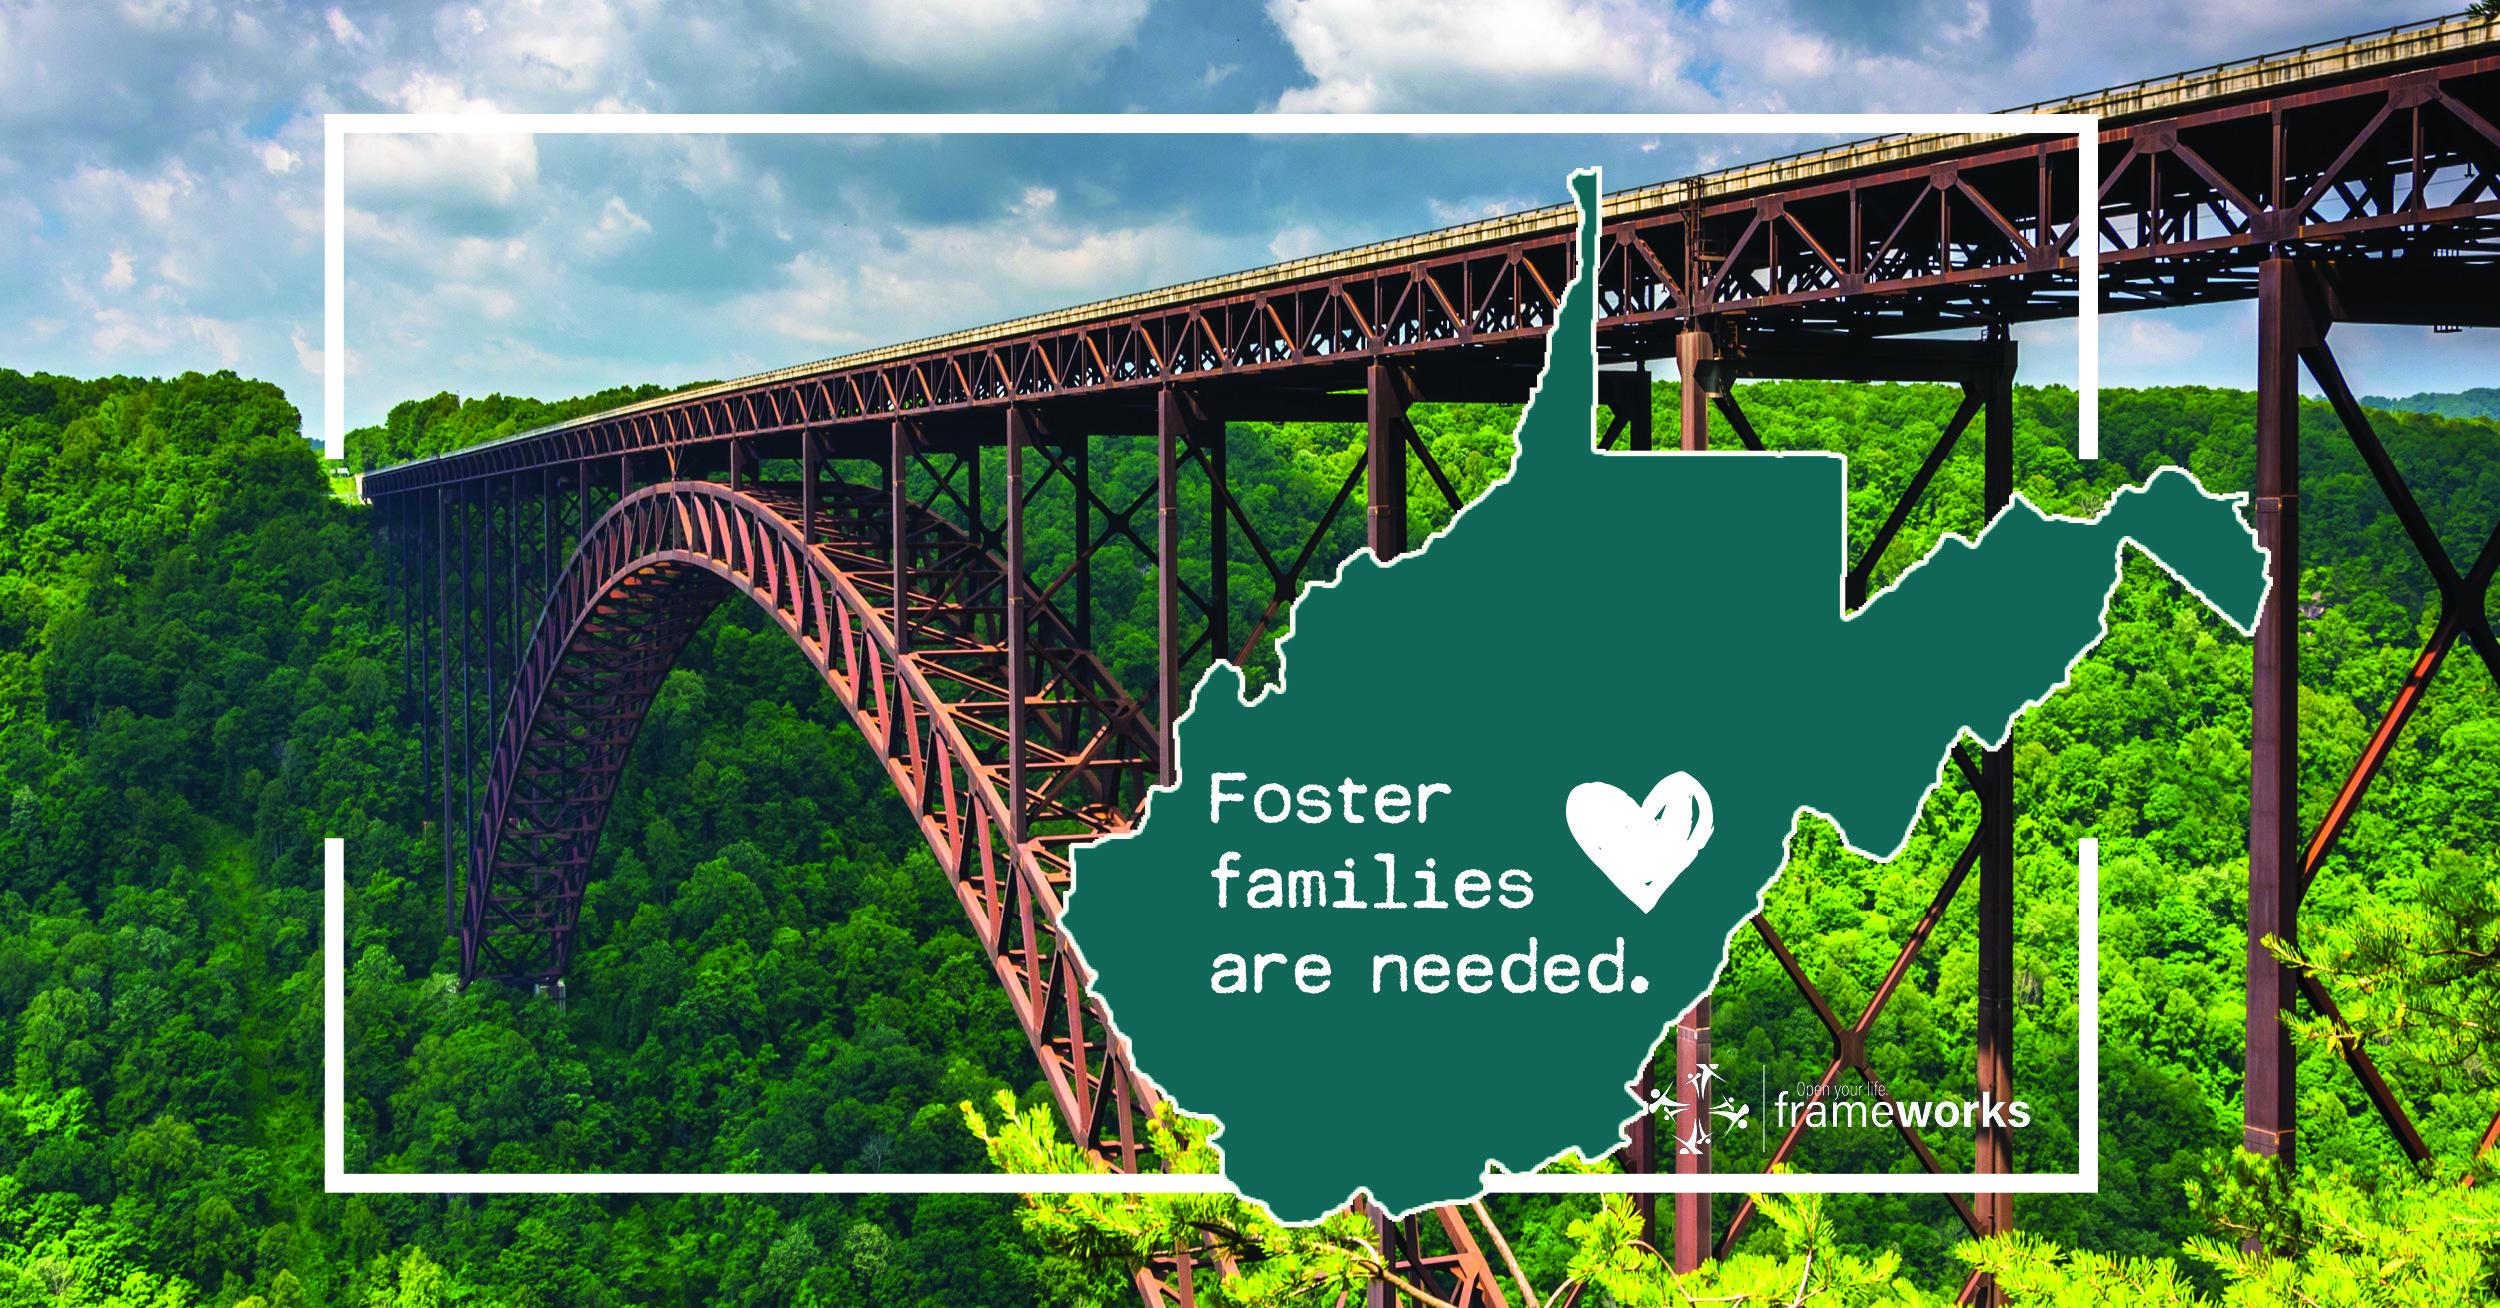 WV Families Needed with bridge ad.jpg